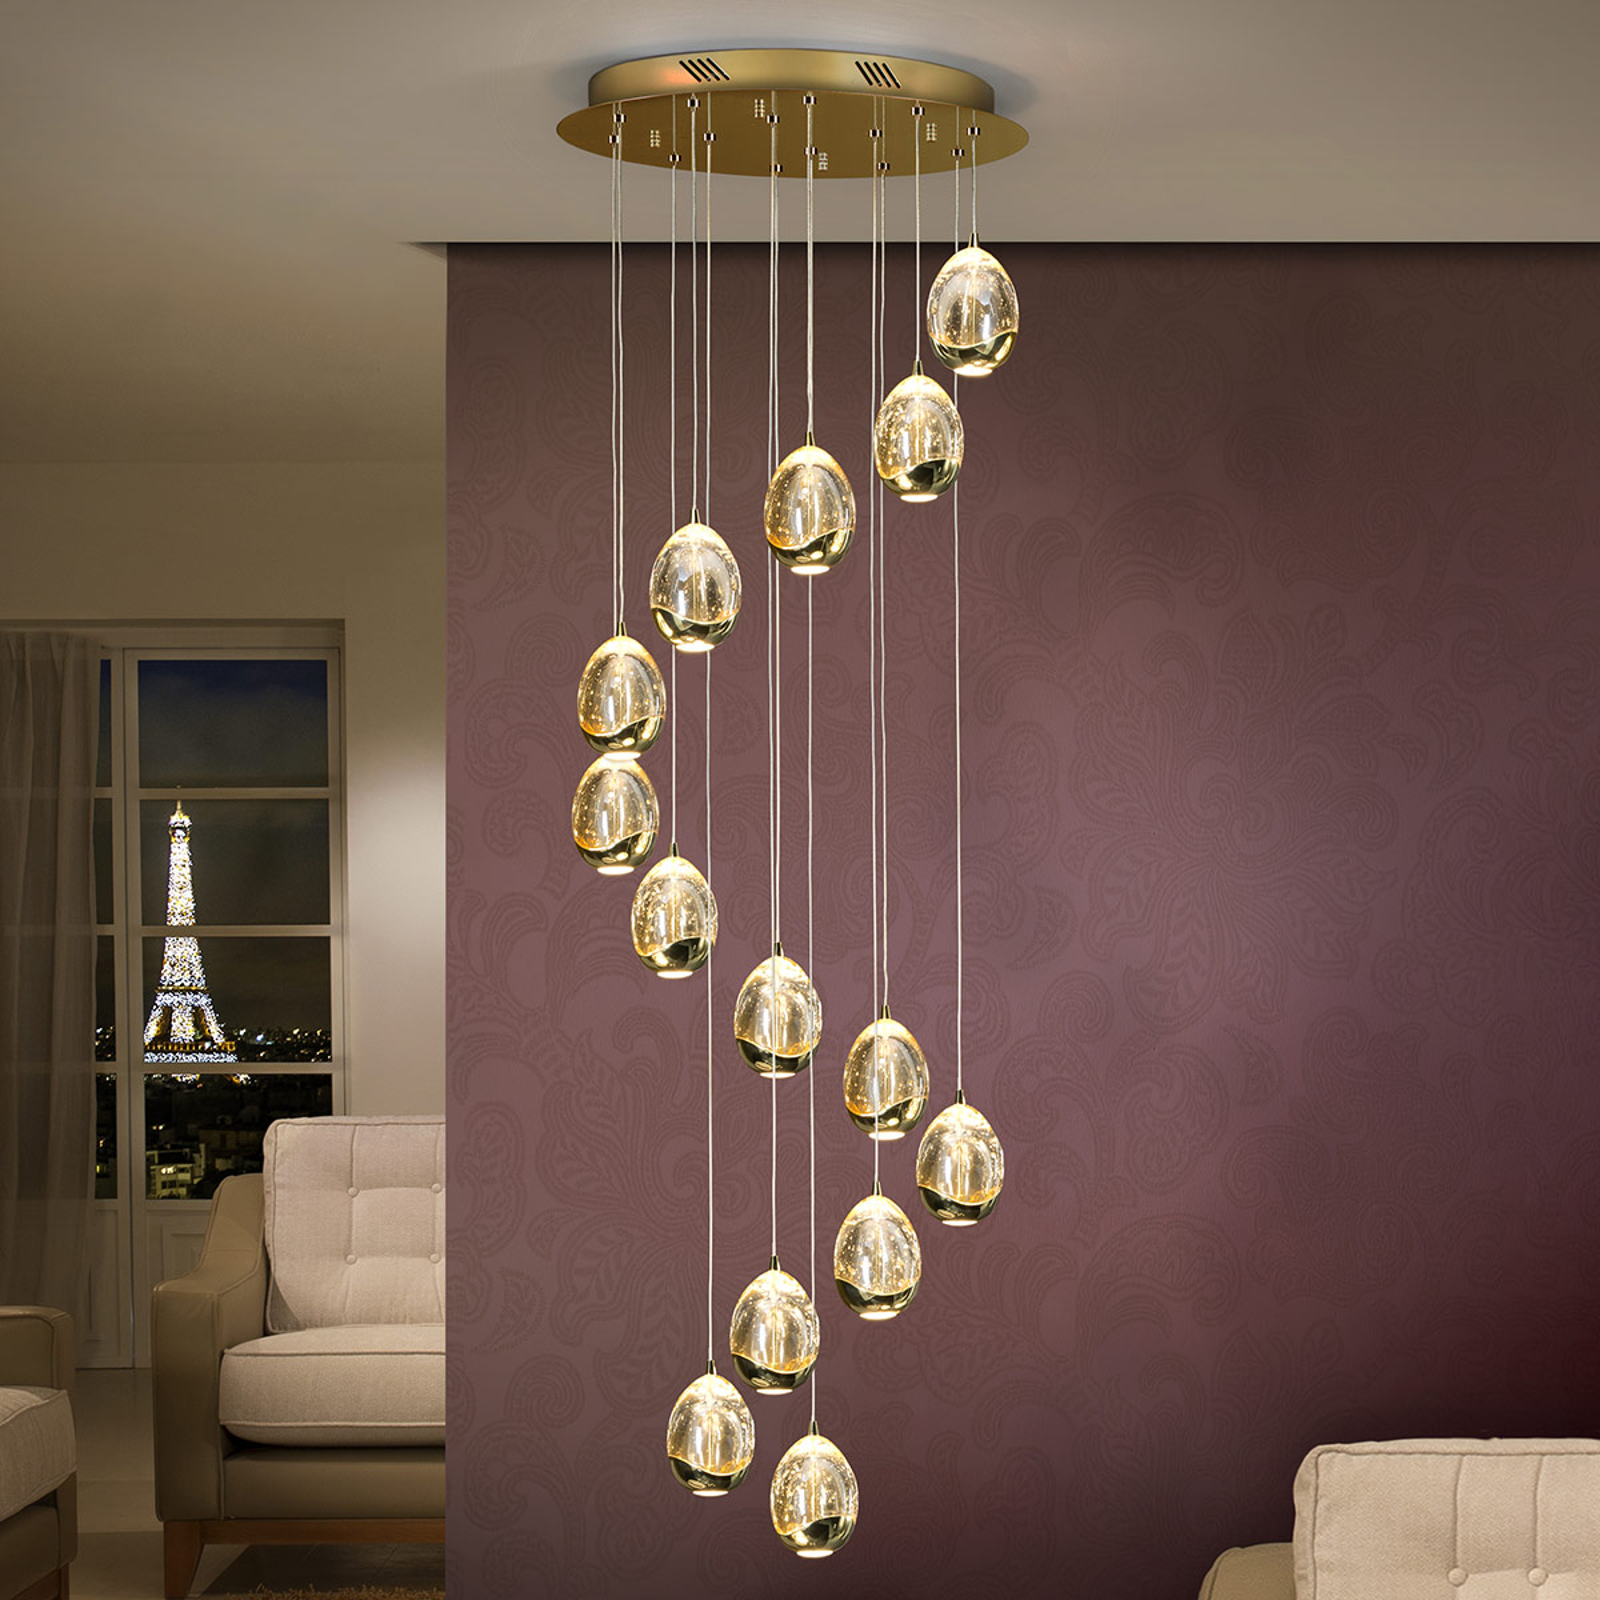 Rocio LED-pendellampe 14 lyskilder gull Bluetooth